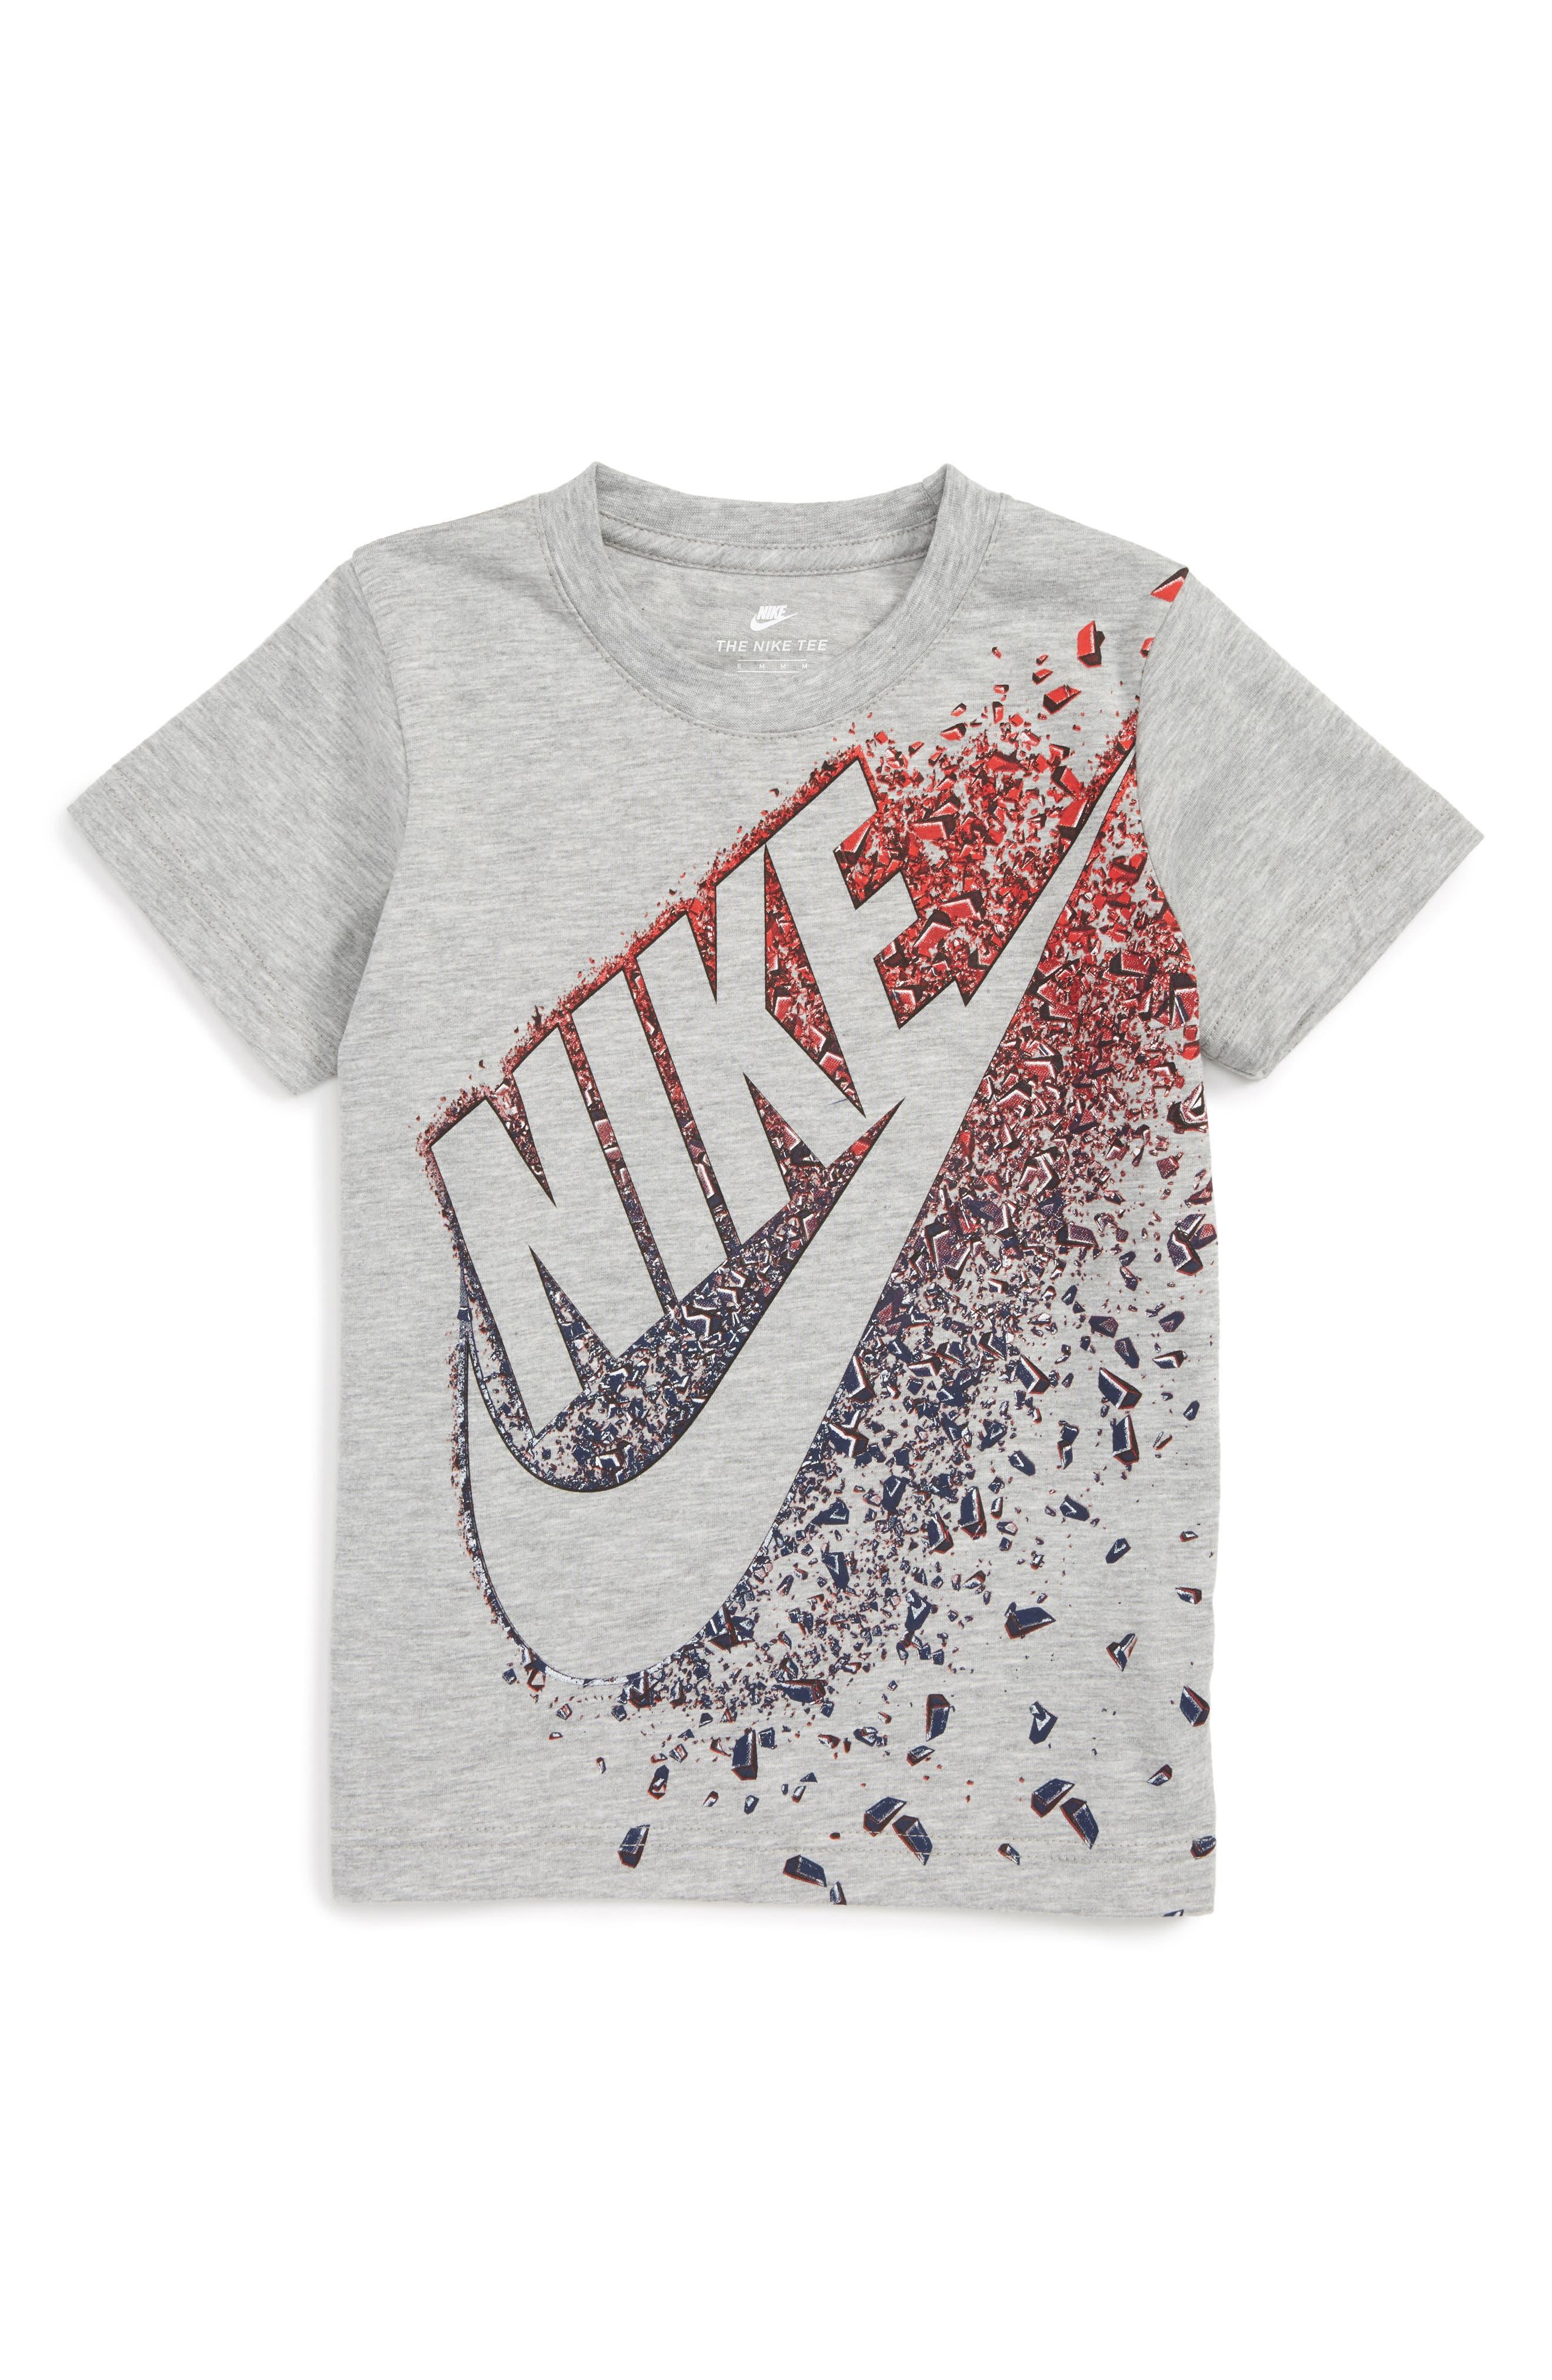 Nike Futura Graphic T-Shirt (Toddler Boys & Little Boys)